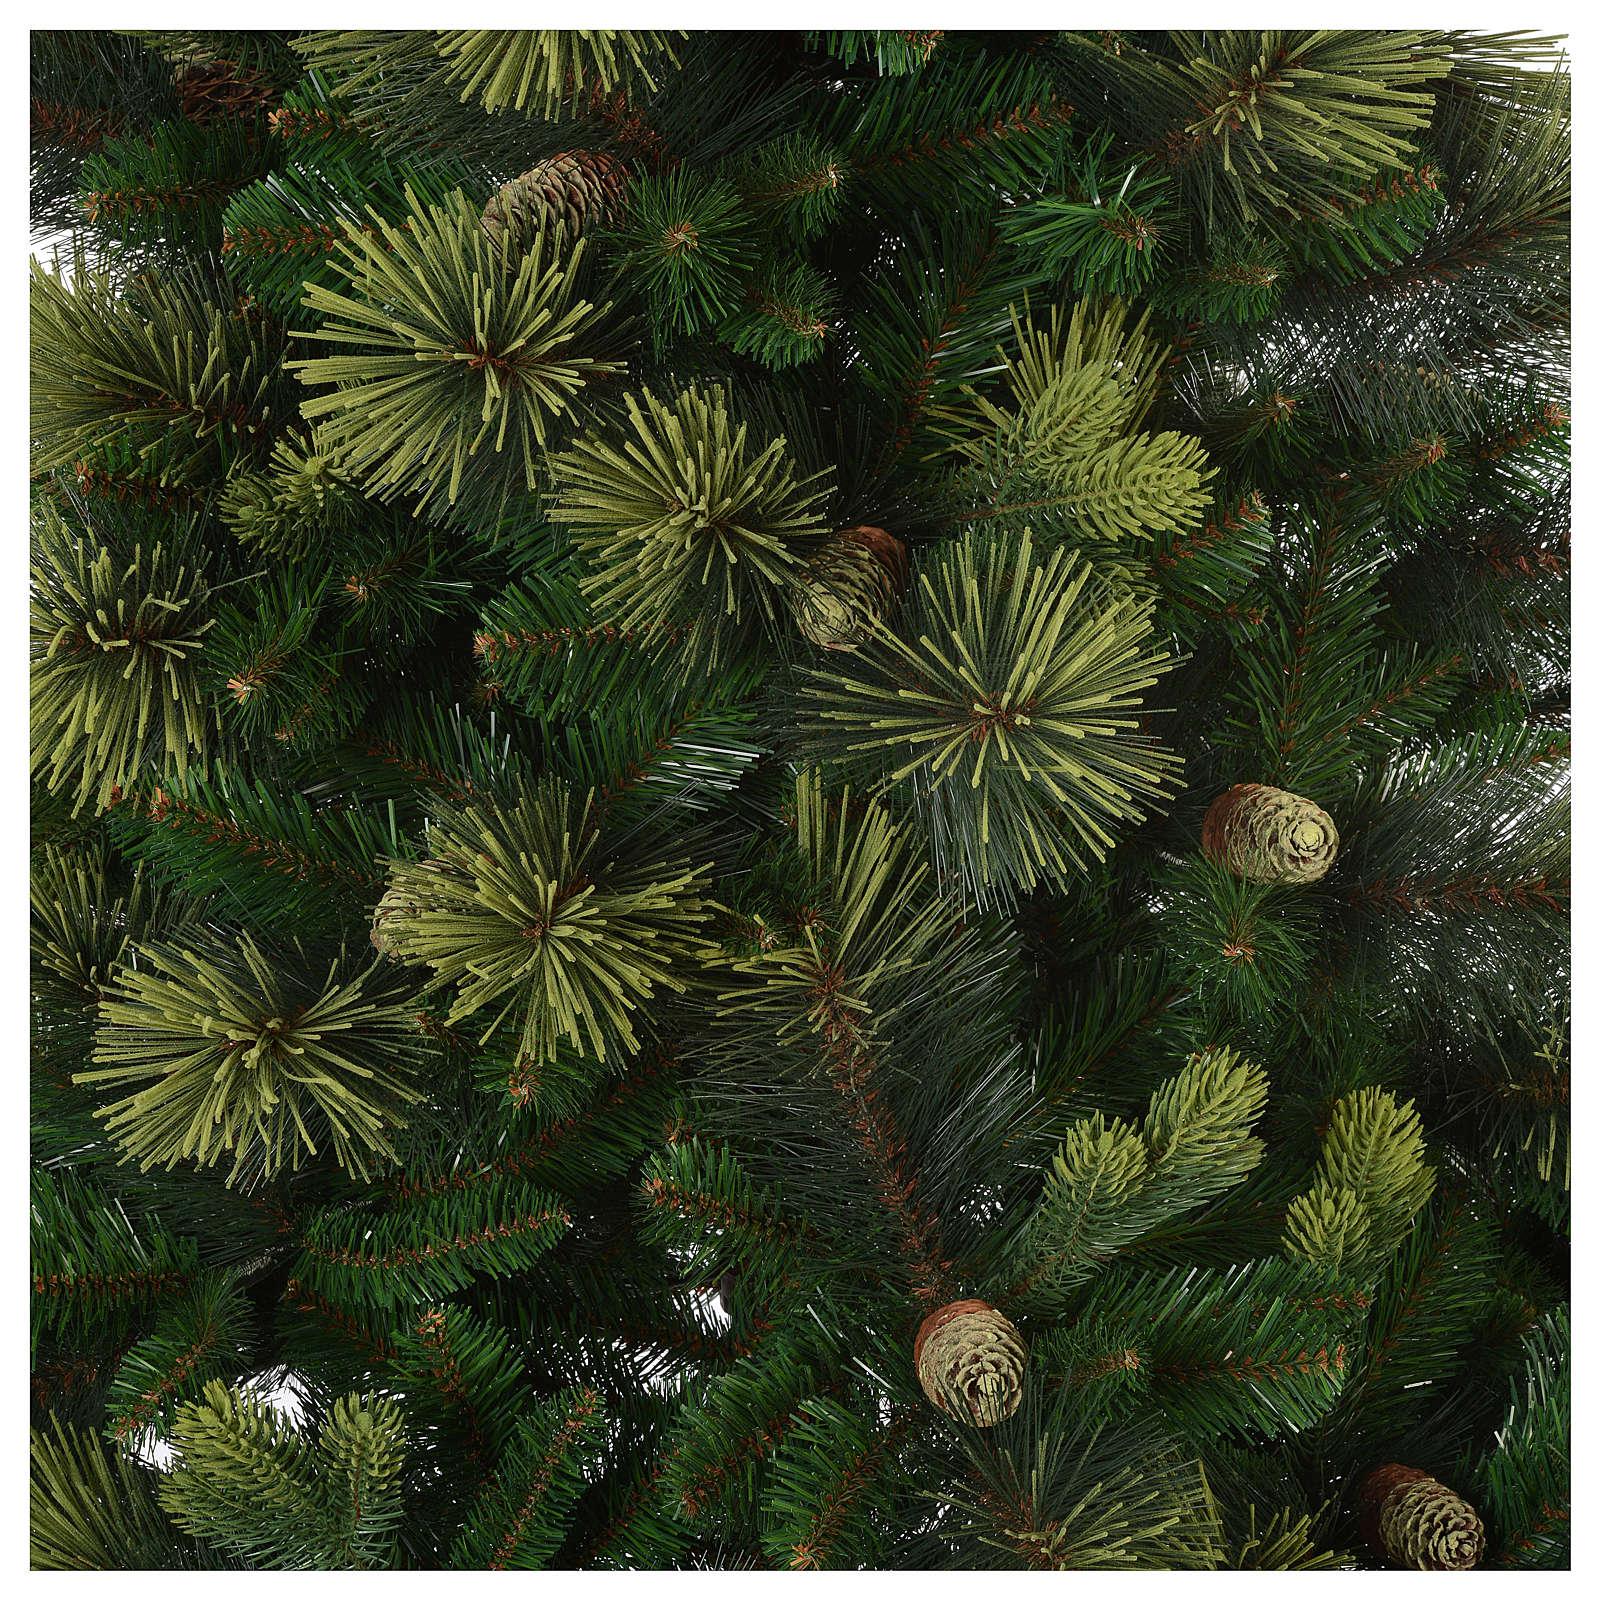 Christmas tree 225 cm, green with pine cones Carolina 3